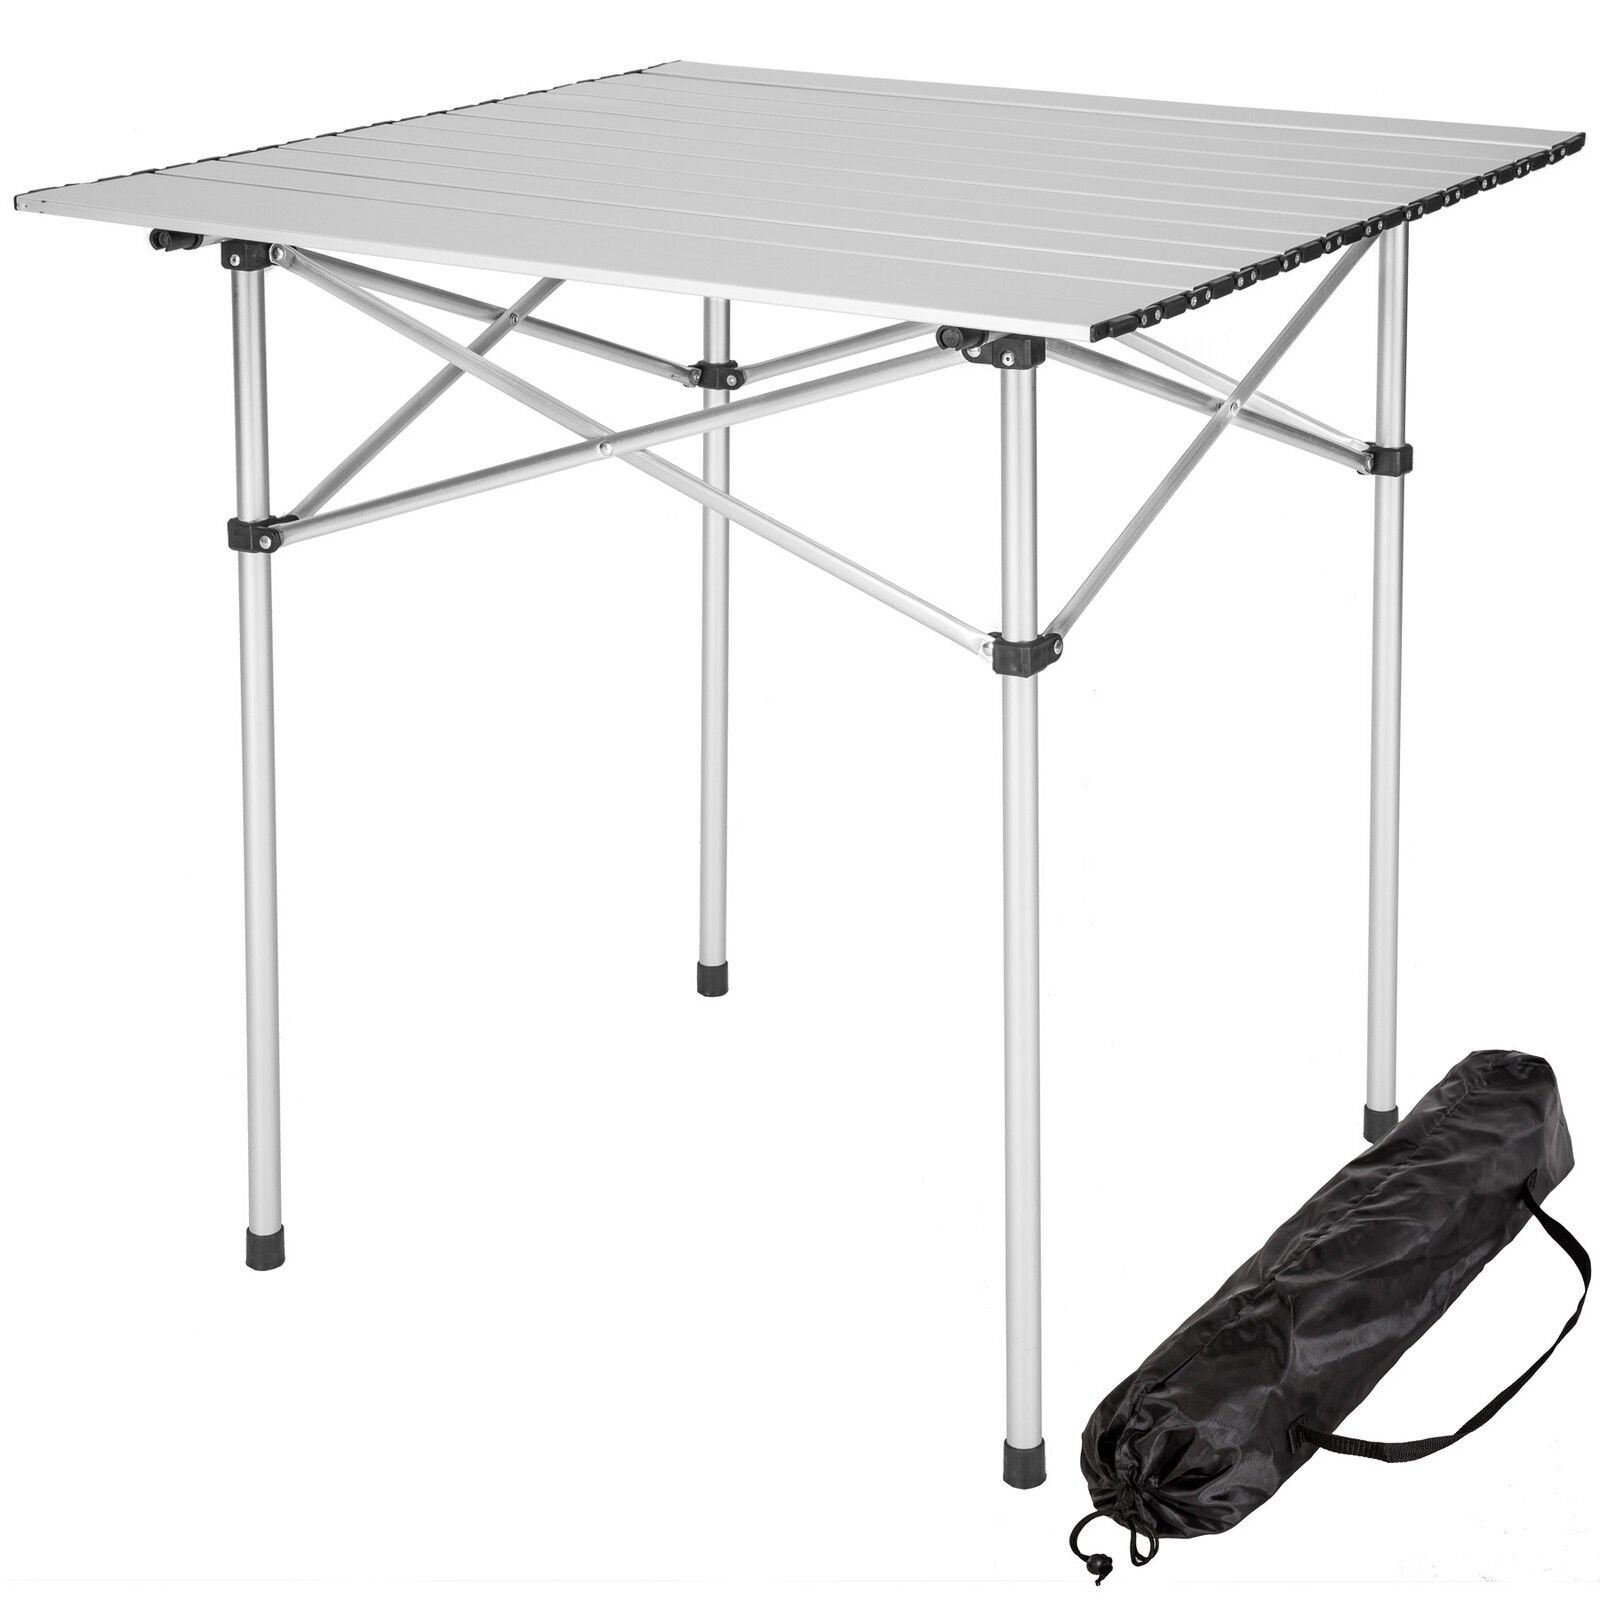 Mesa plegable enrollable de aluminio portátil camping multifuncional 70x70x70 cm